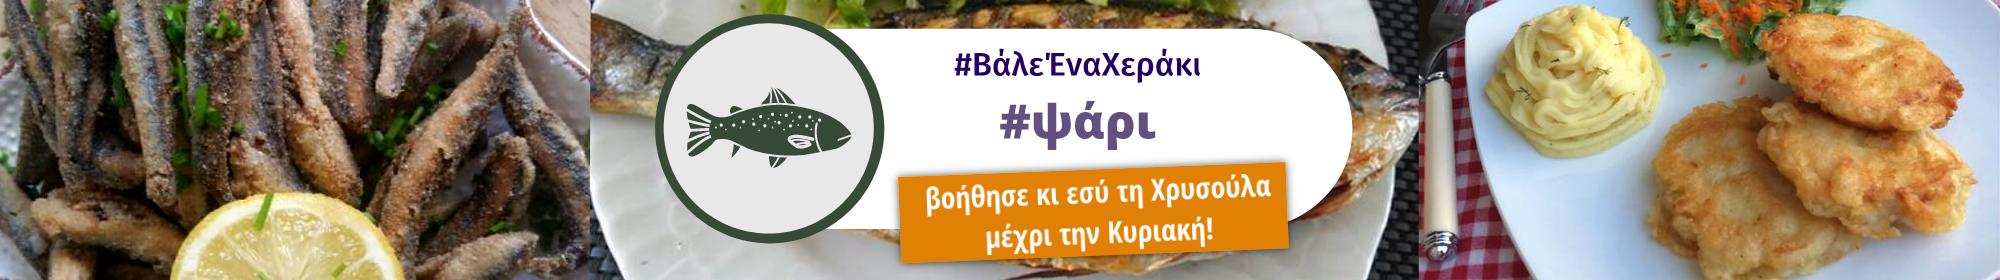 Challenge 5: #ΒάλεΈναΧεράκι για να φάει ψάρι